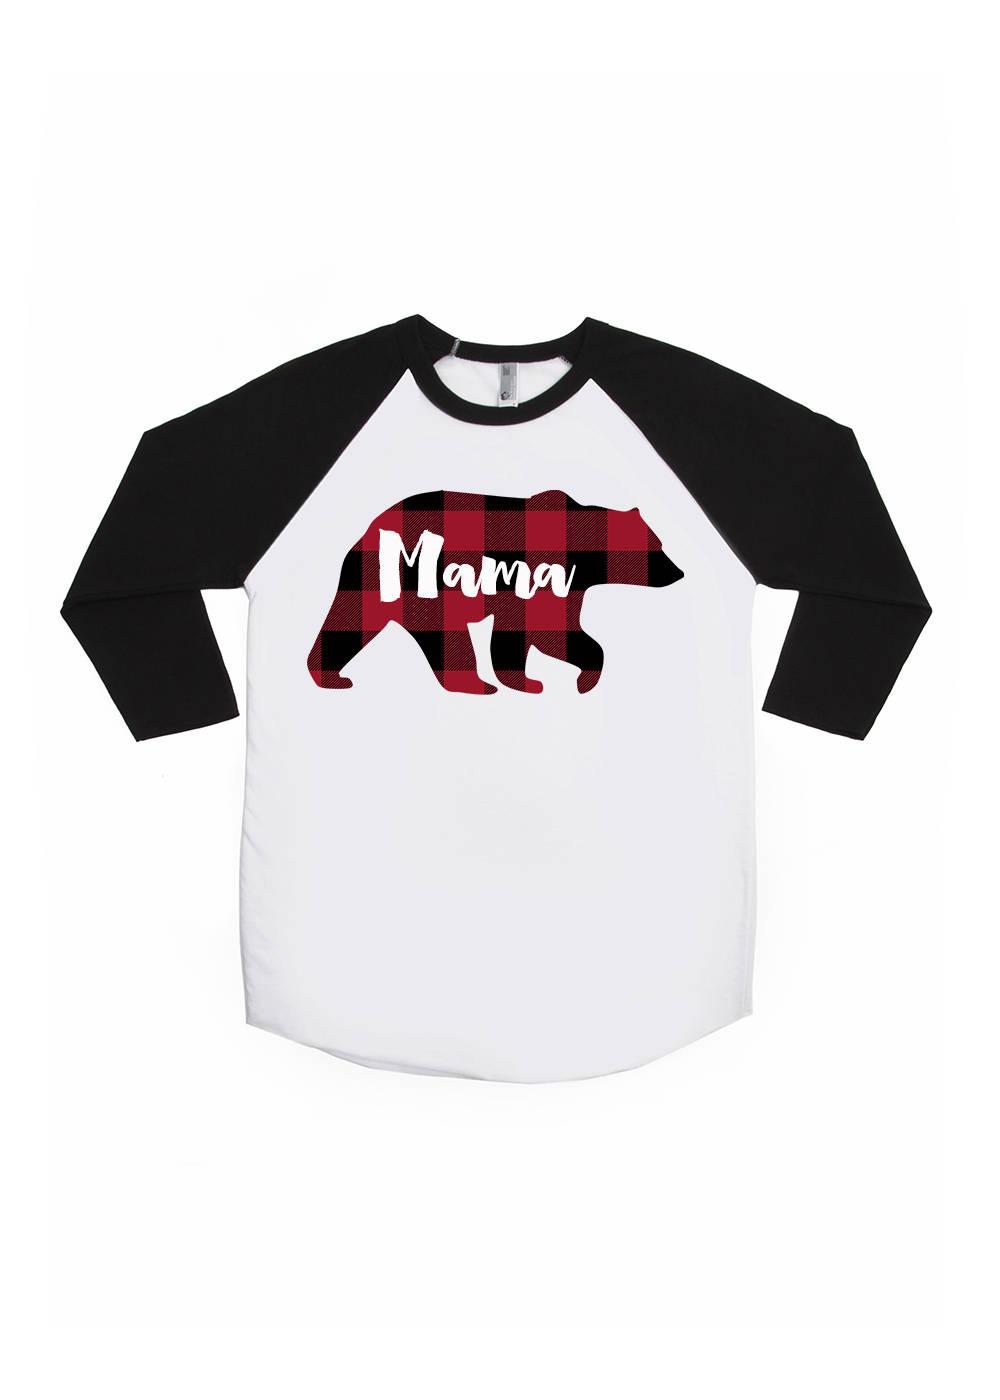 Mama Bear Buffalo Plaid Shirt Unisex Adult Raglans